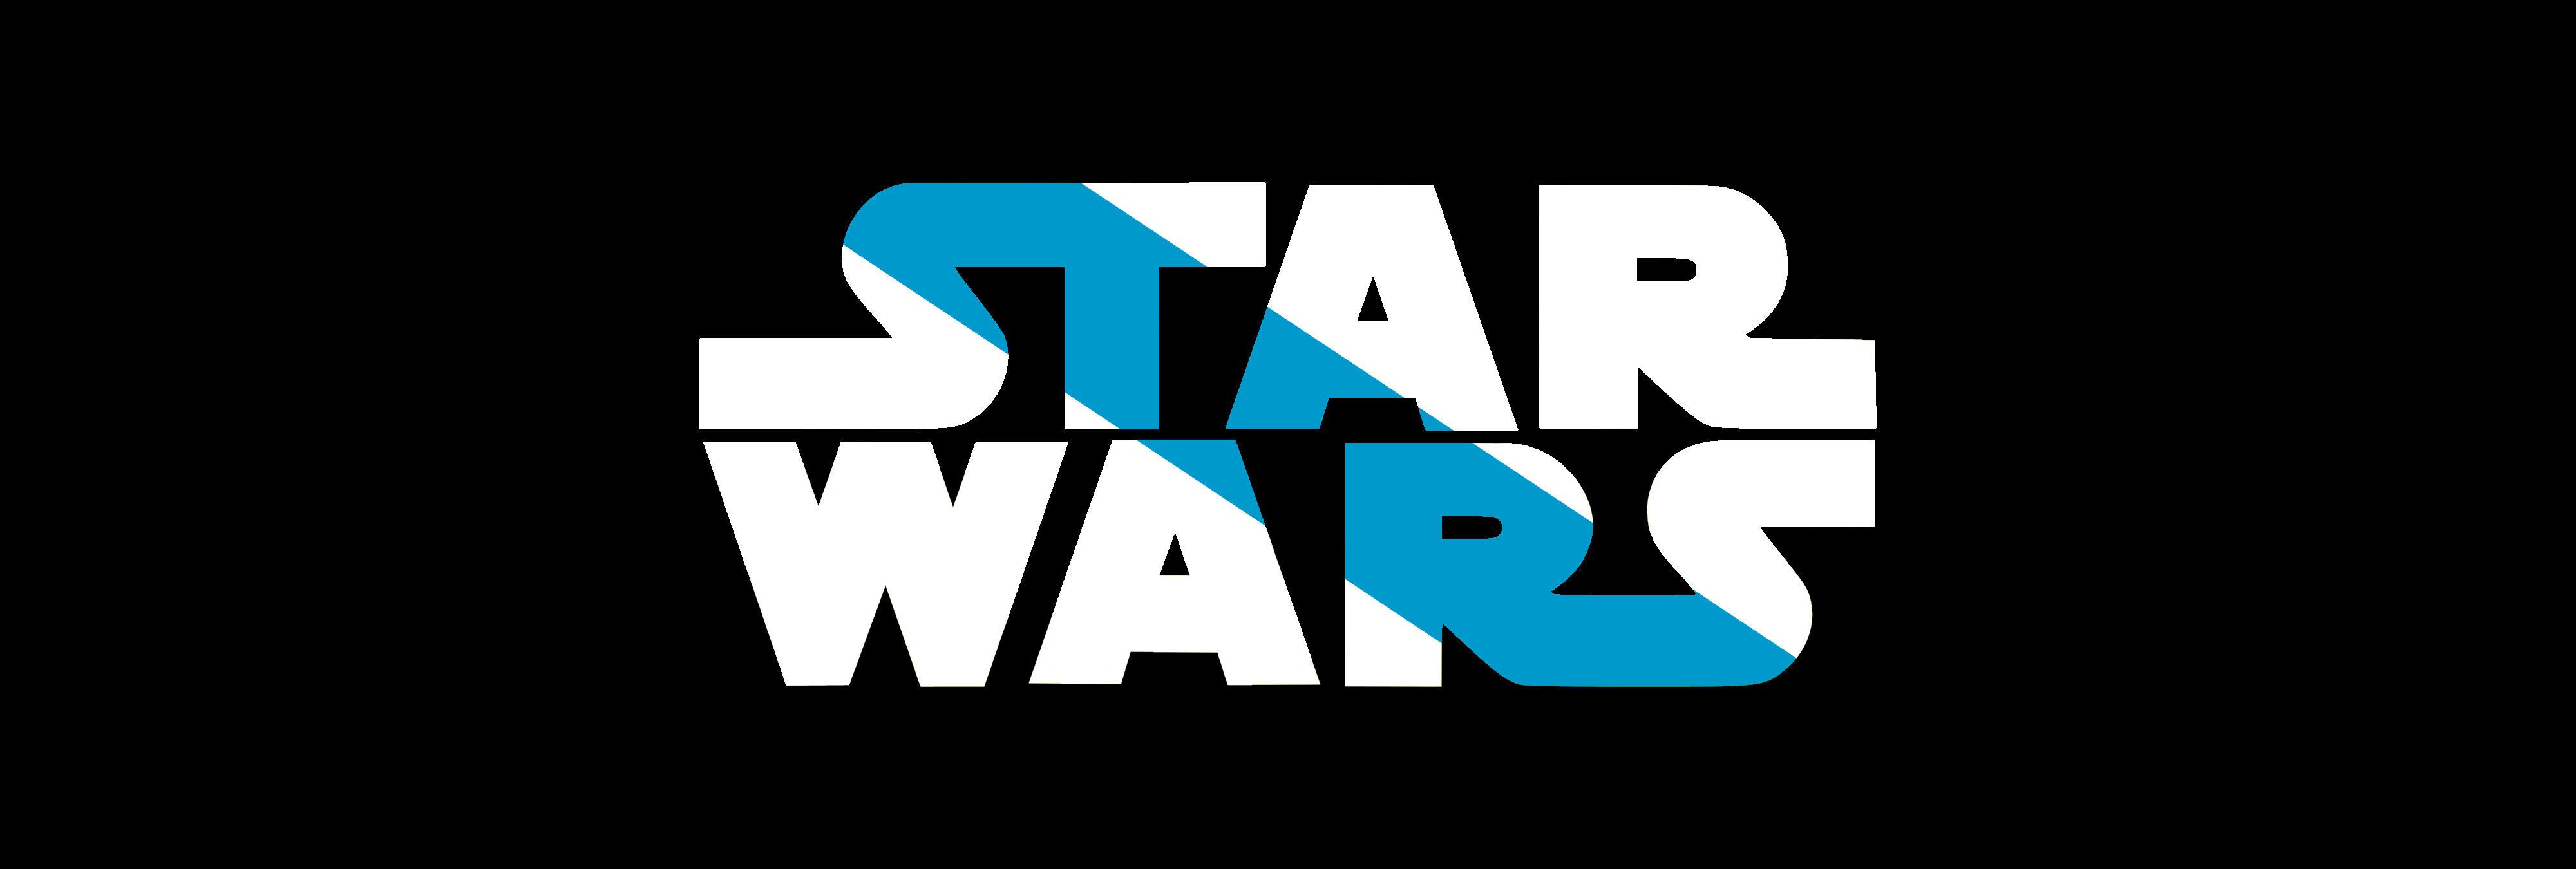 ¡Eu son teu pai, carallo! Los tuiteros imaginan 'Star Wars' en gallego